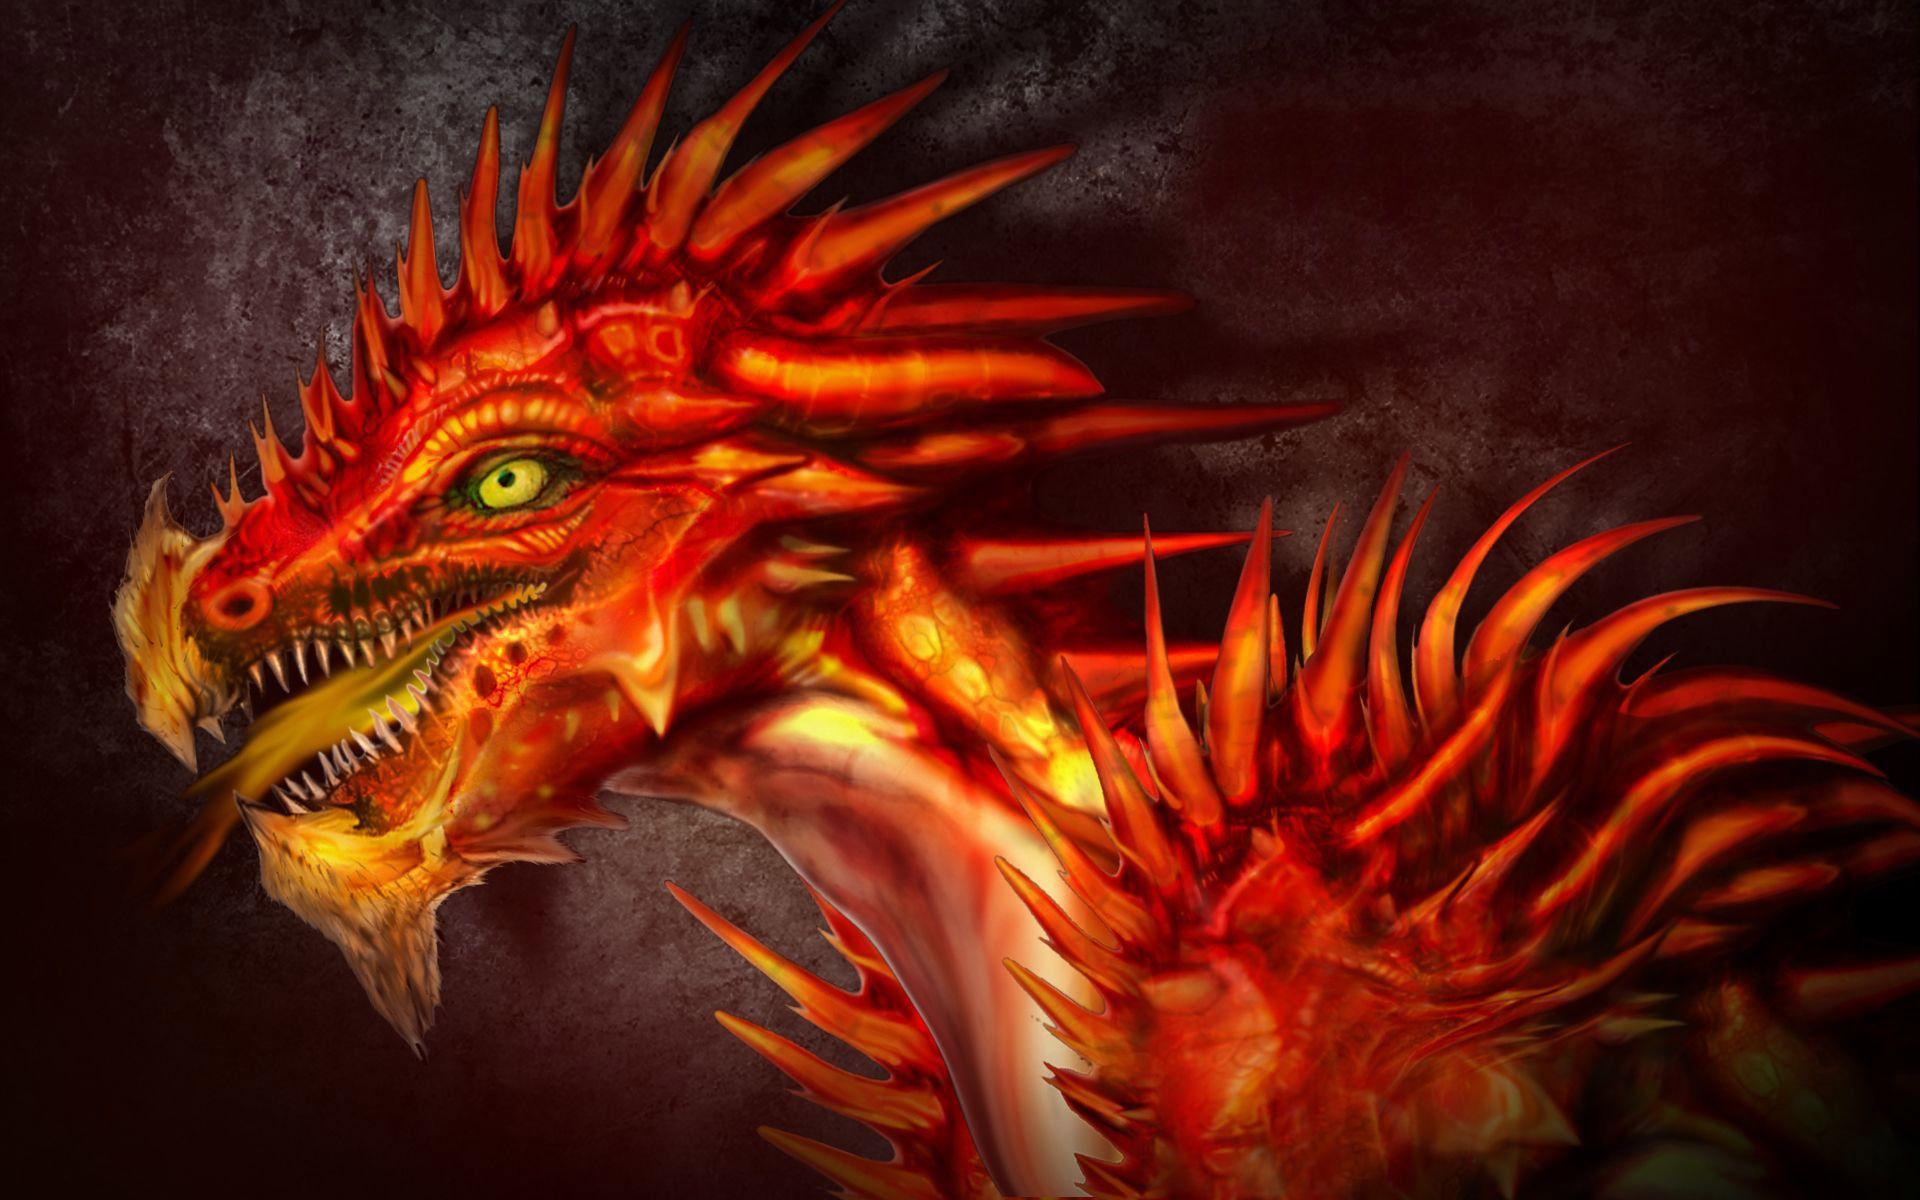 Fire Dragon Wallpaper 51289